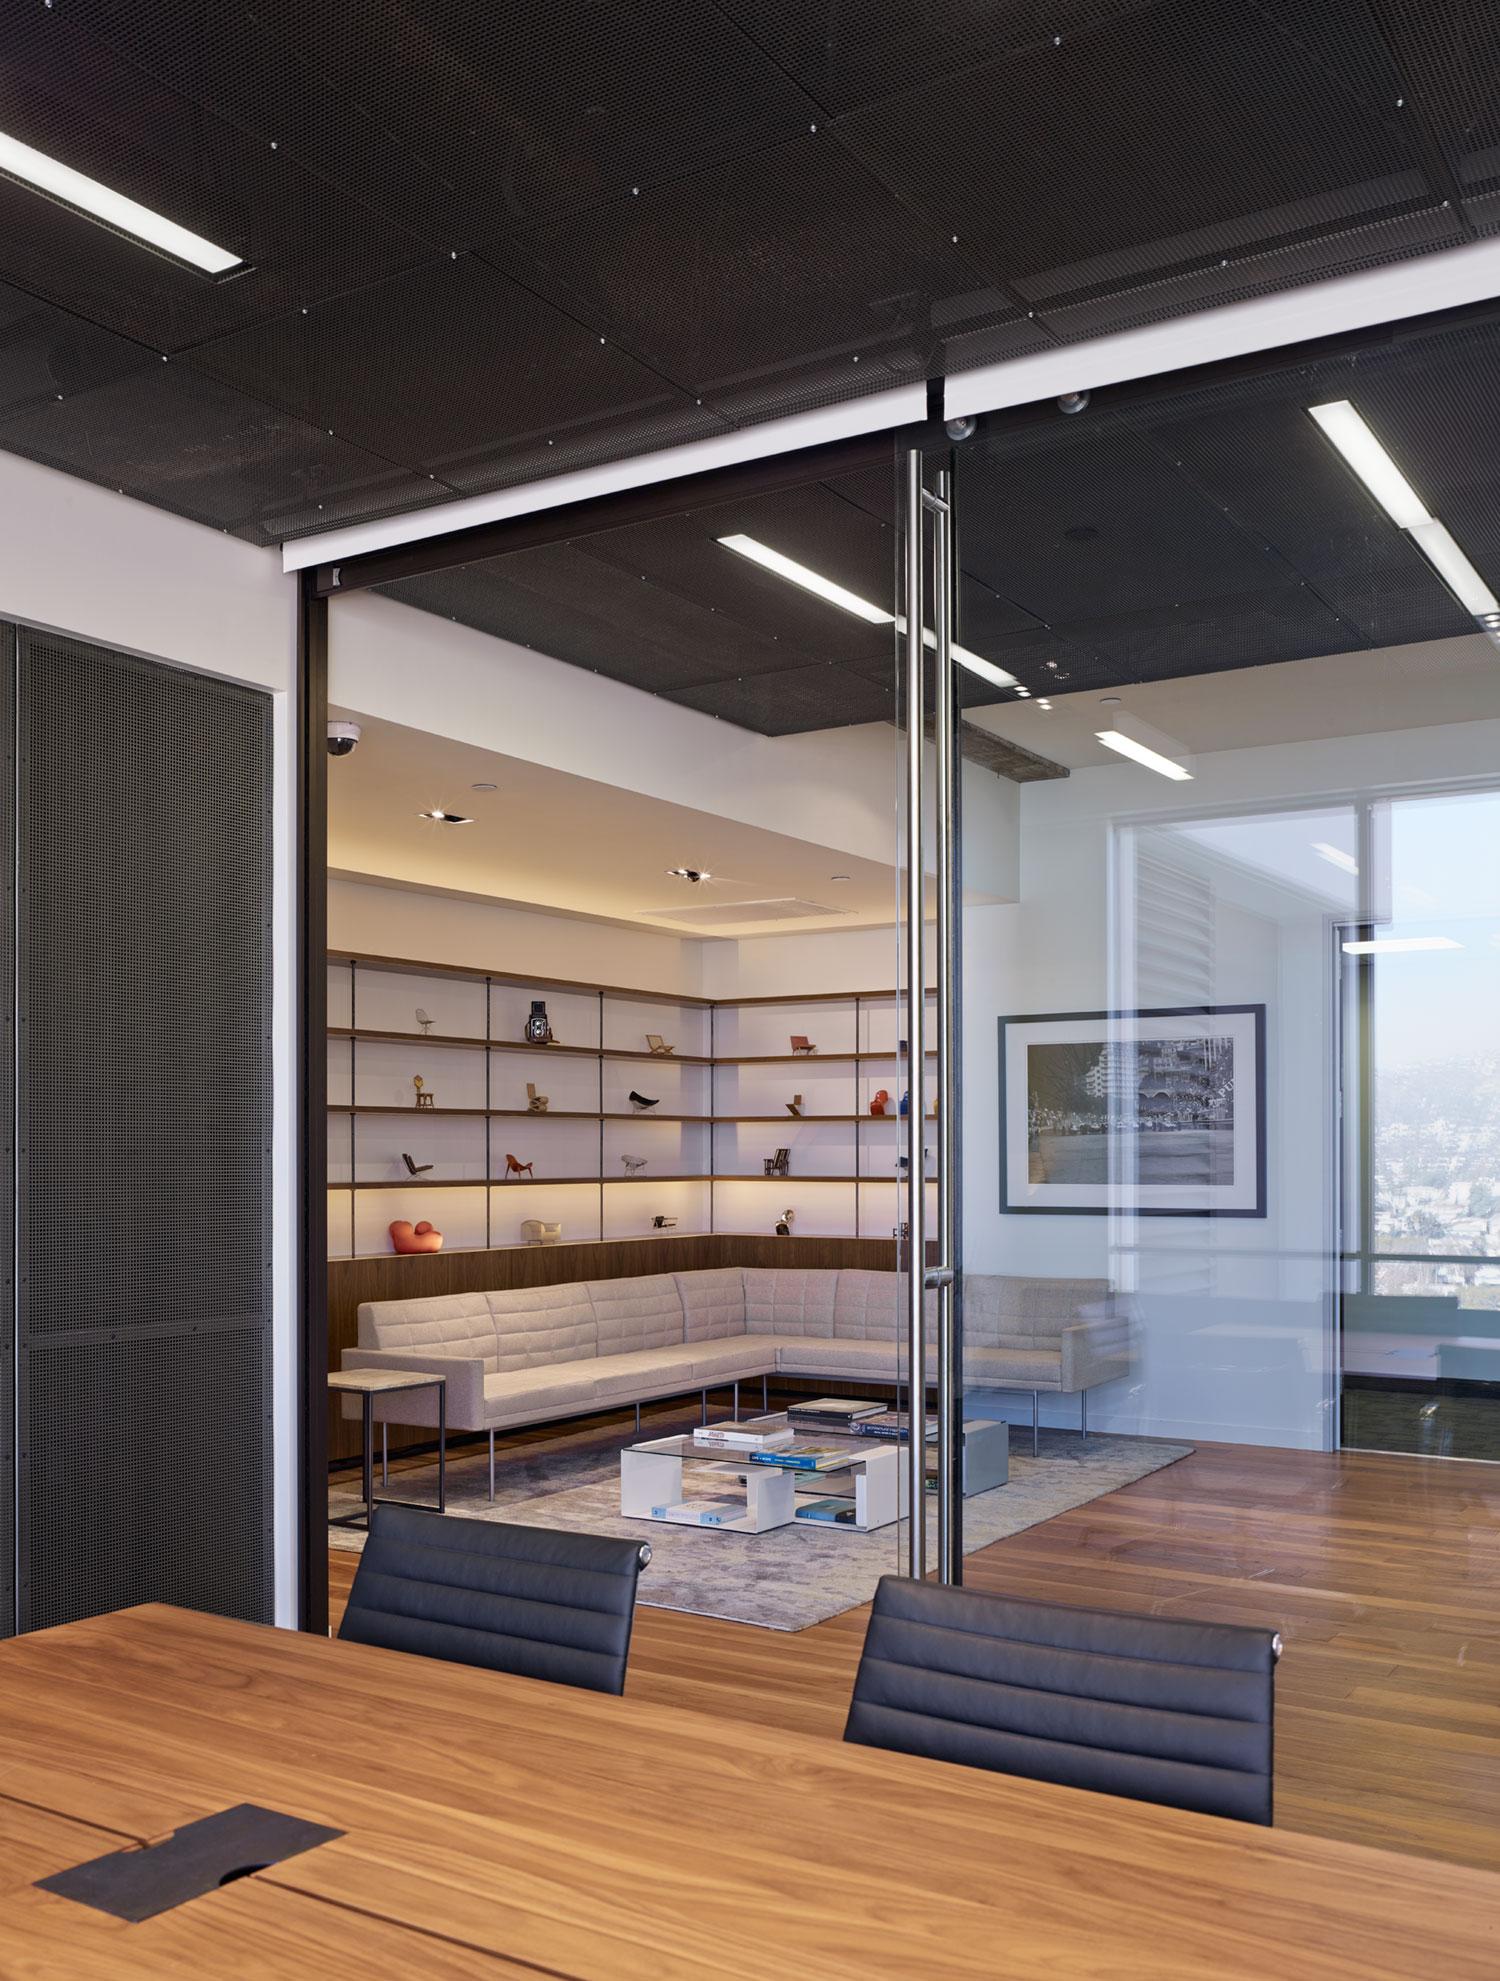 modern-architecture-commercial-interiors-workplace-office-custom-fabrication-california-shubindonaldson-freemark-financial-04